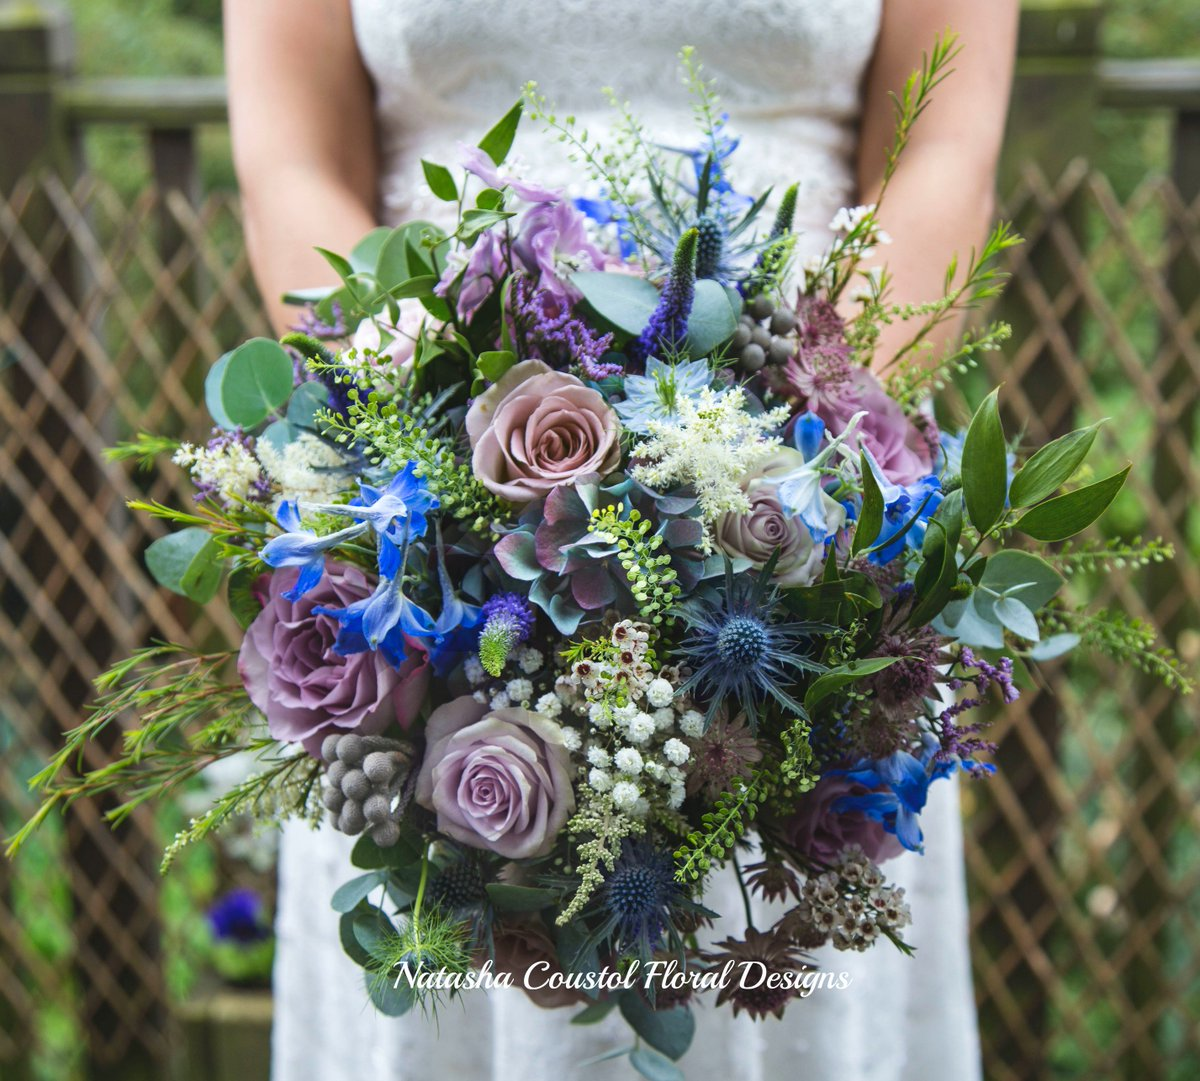 Natasha Coustol Floral Designs On Twitter Antique Blue Hydrangea Dusky Pink Roses Vintage Feel Bridal Bouquet Weddinghour Yorkshireweddings Https T Co Ldyfsgjur7